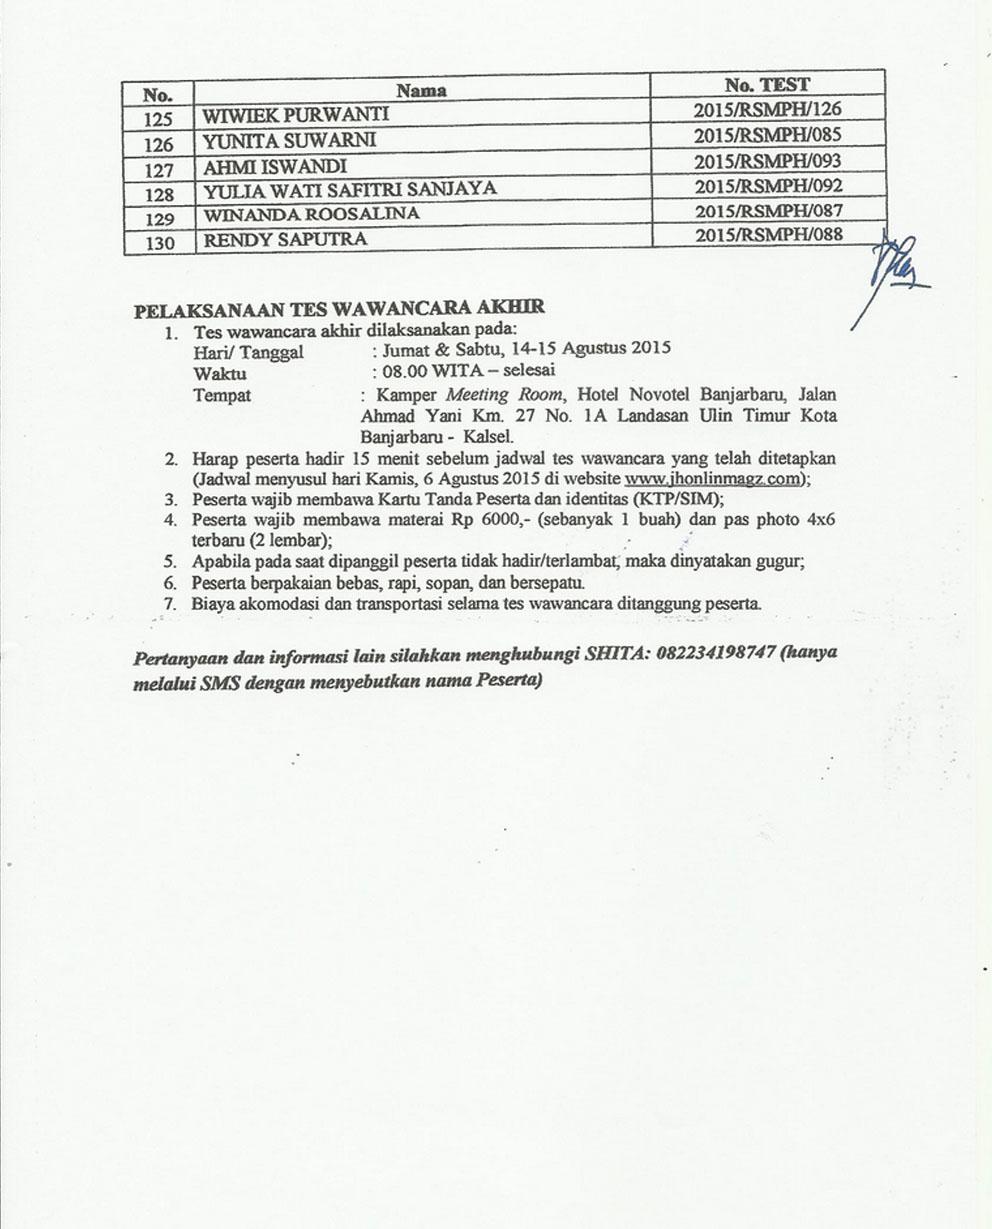 Marina Permata Hospital, Batulicin, Tanah Bumbu, Kalimantan Selatan, Rumah Sakit, PT. Erina Citra Gemilang